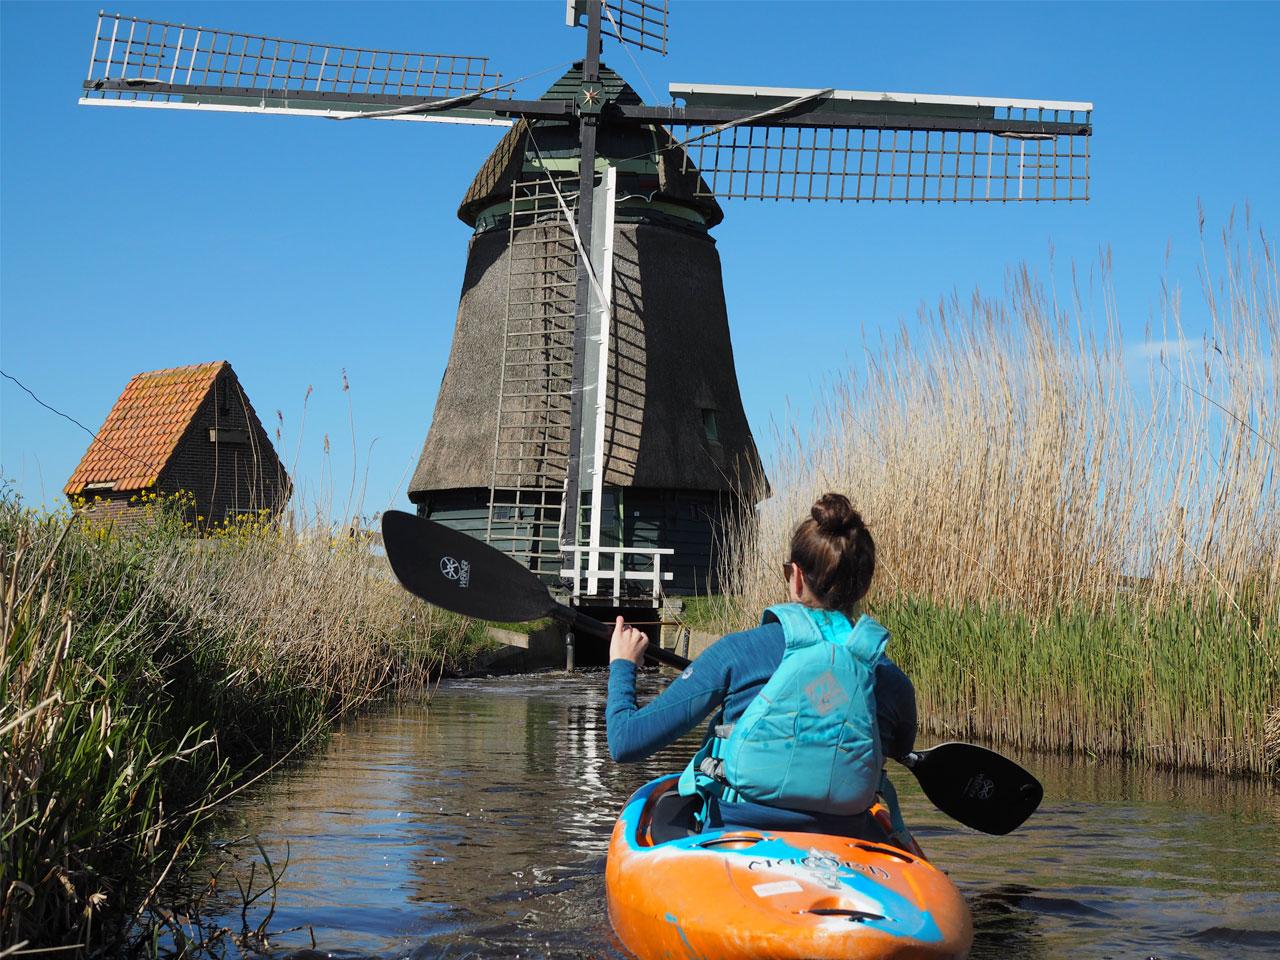 De leukste Kajaktoertochten in Nederland. Je kajakt langs molens, bunkers en kastelen.